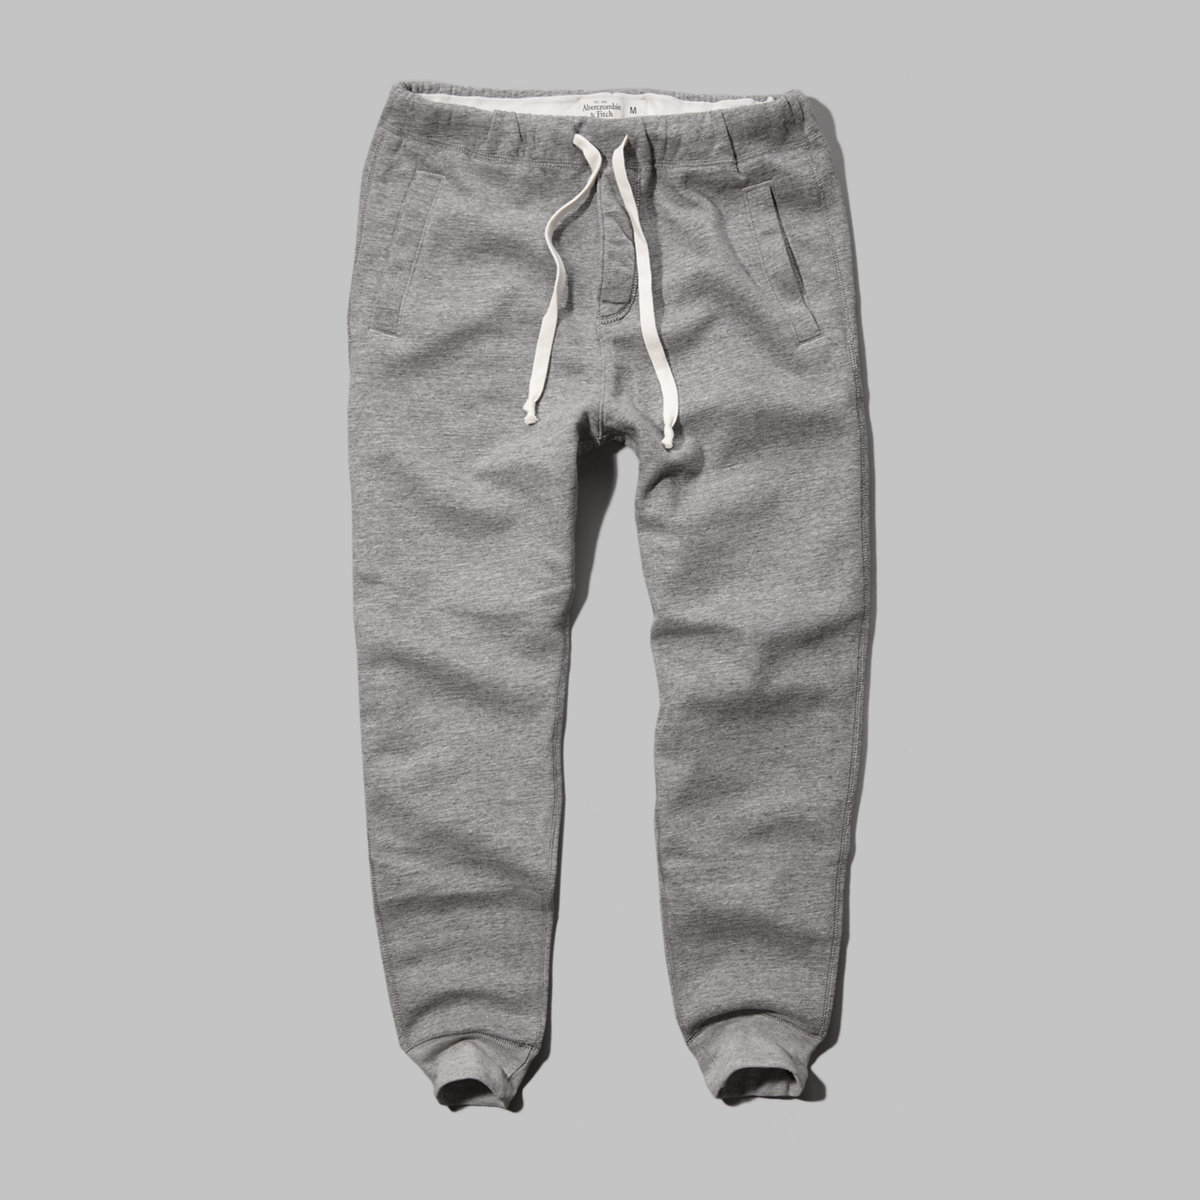 A&F Cuff Jogger Sweatpants